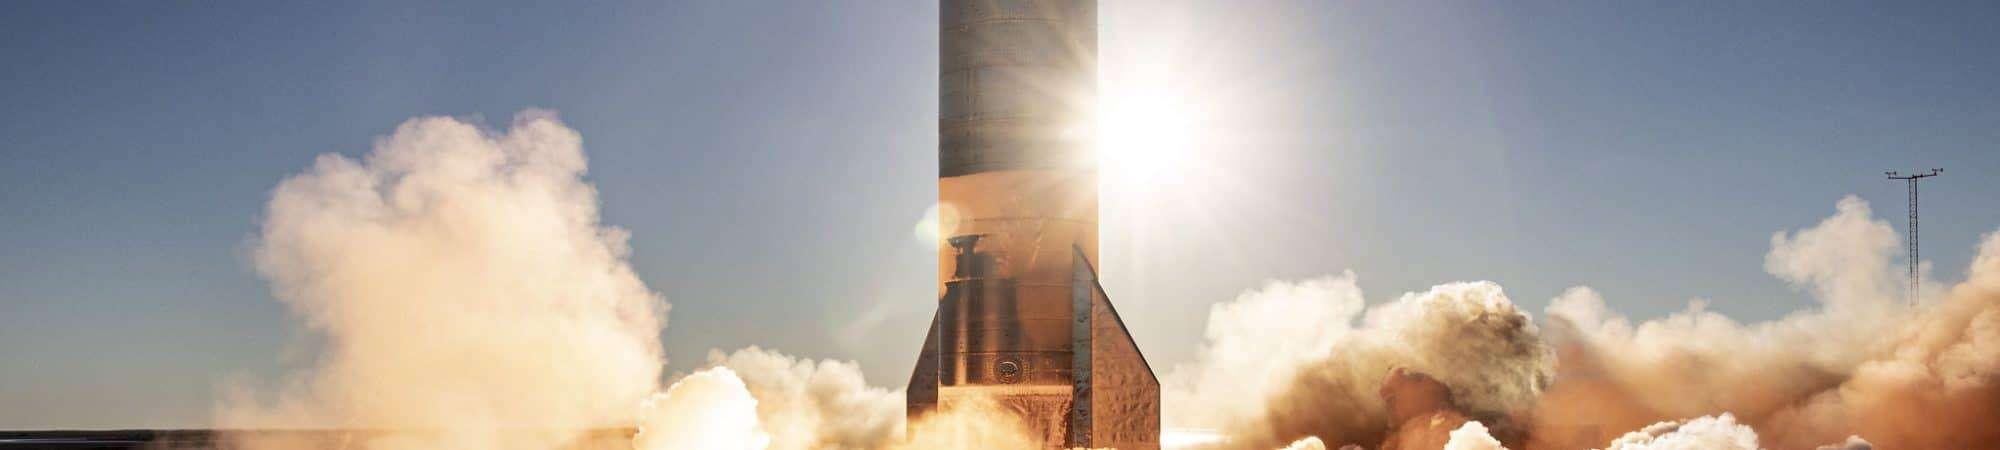 Lançamento da Starship SN8